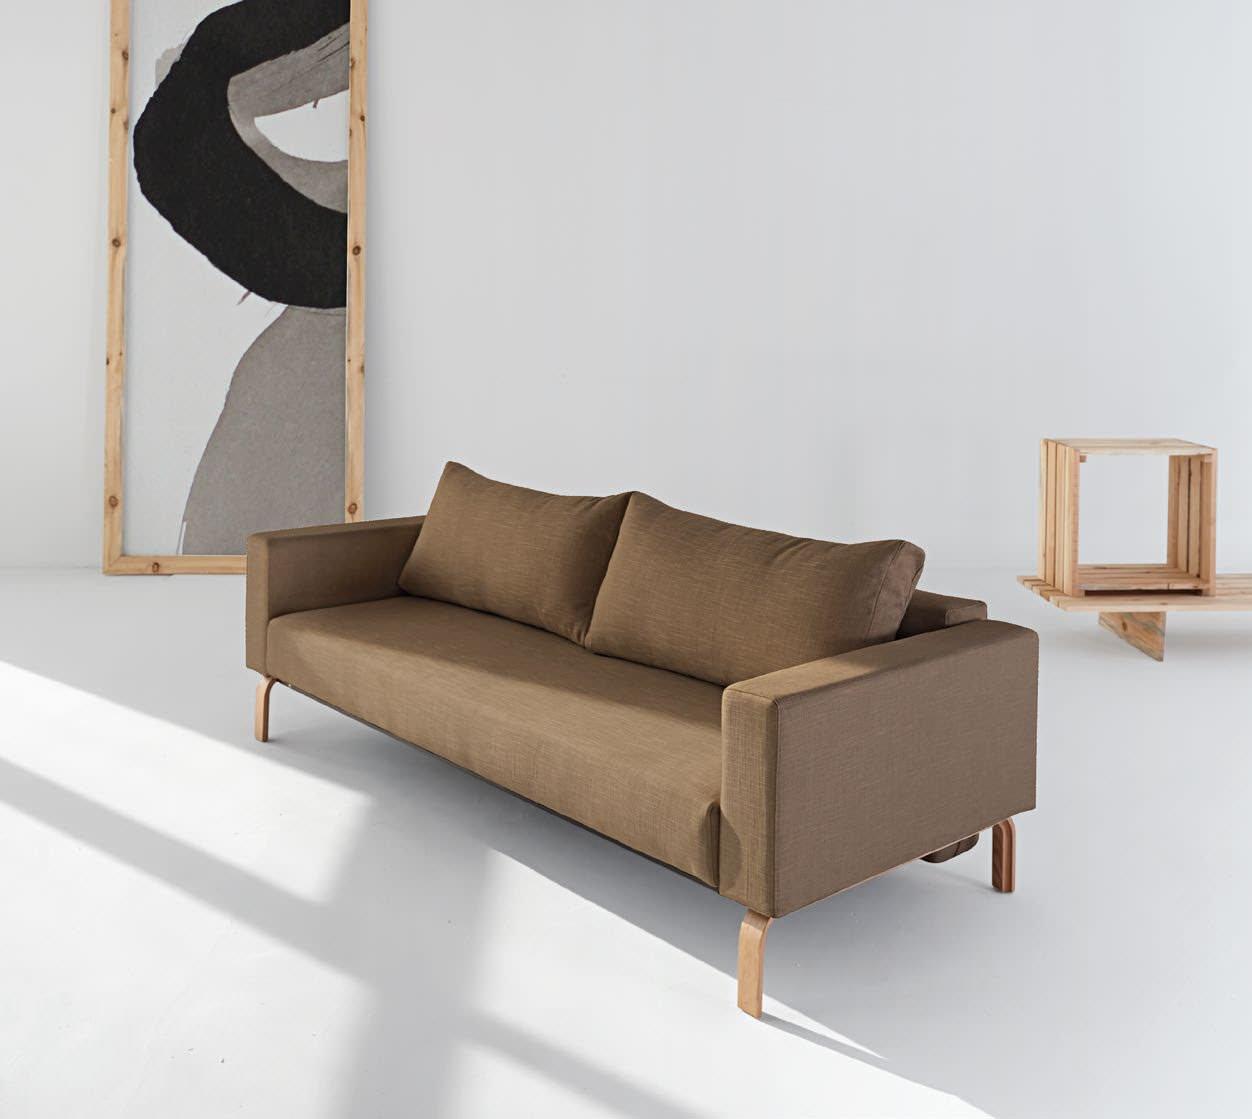 Cassius Sleek Sofa Bed Full Size Dark Khaki By Innovation